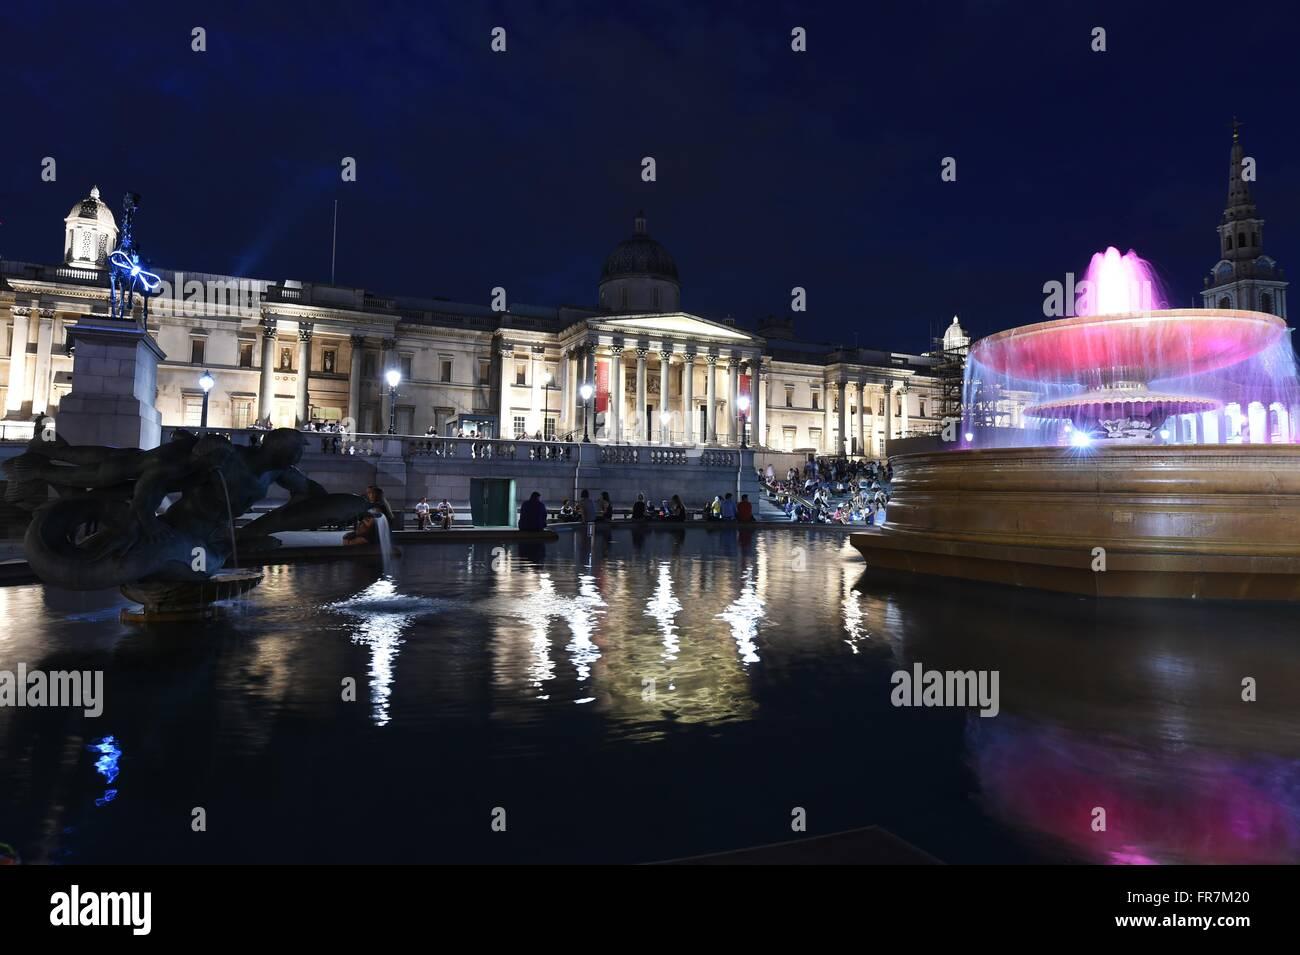 National Gallery, Trafalgar Square, galerie d'art à Londres, Royaume-Uni Photo Stock